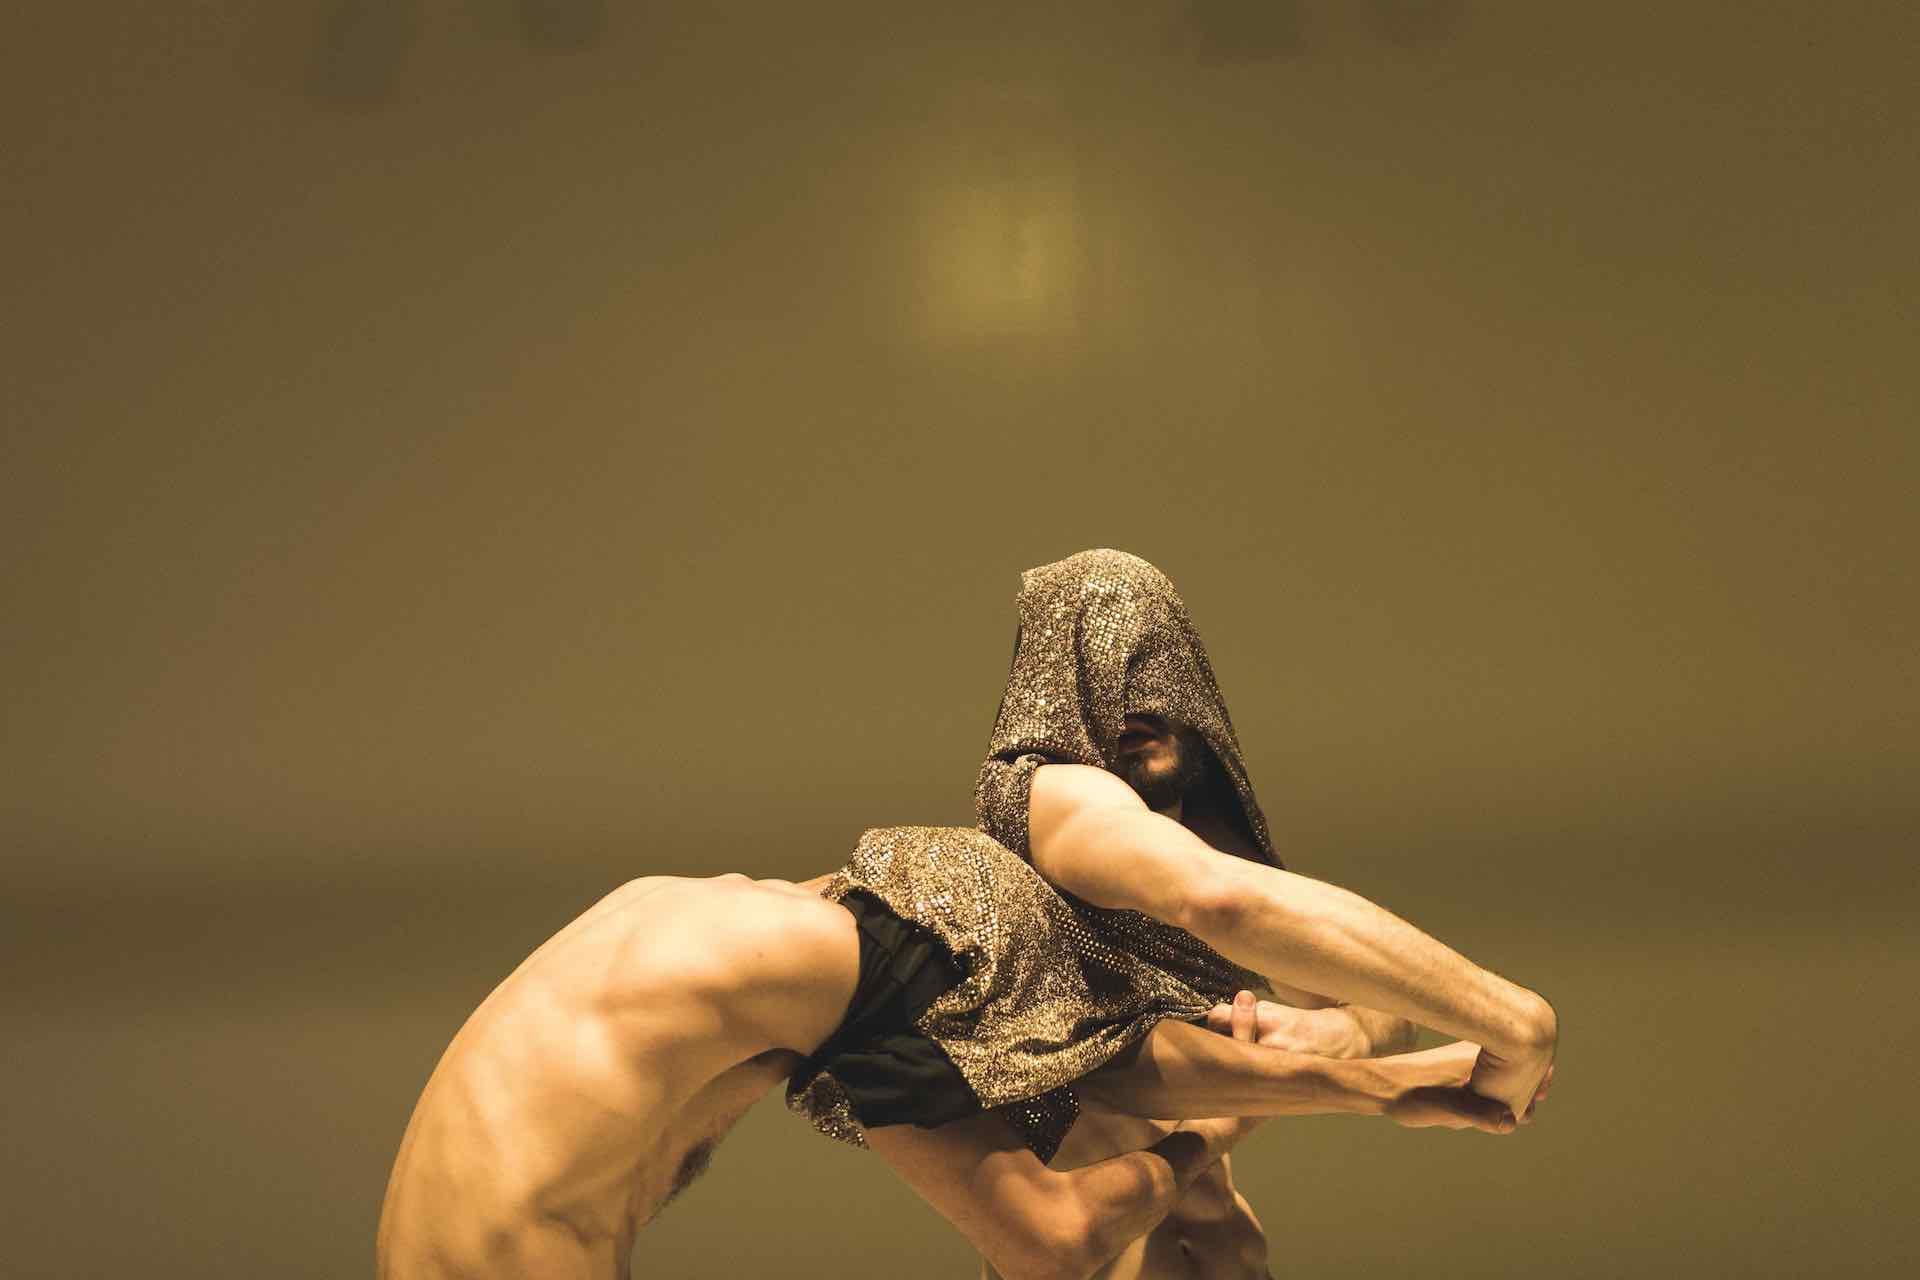 L'età dell'horror / Riccardo Buscarini / TIR Danza